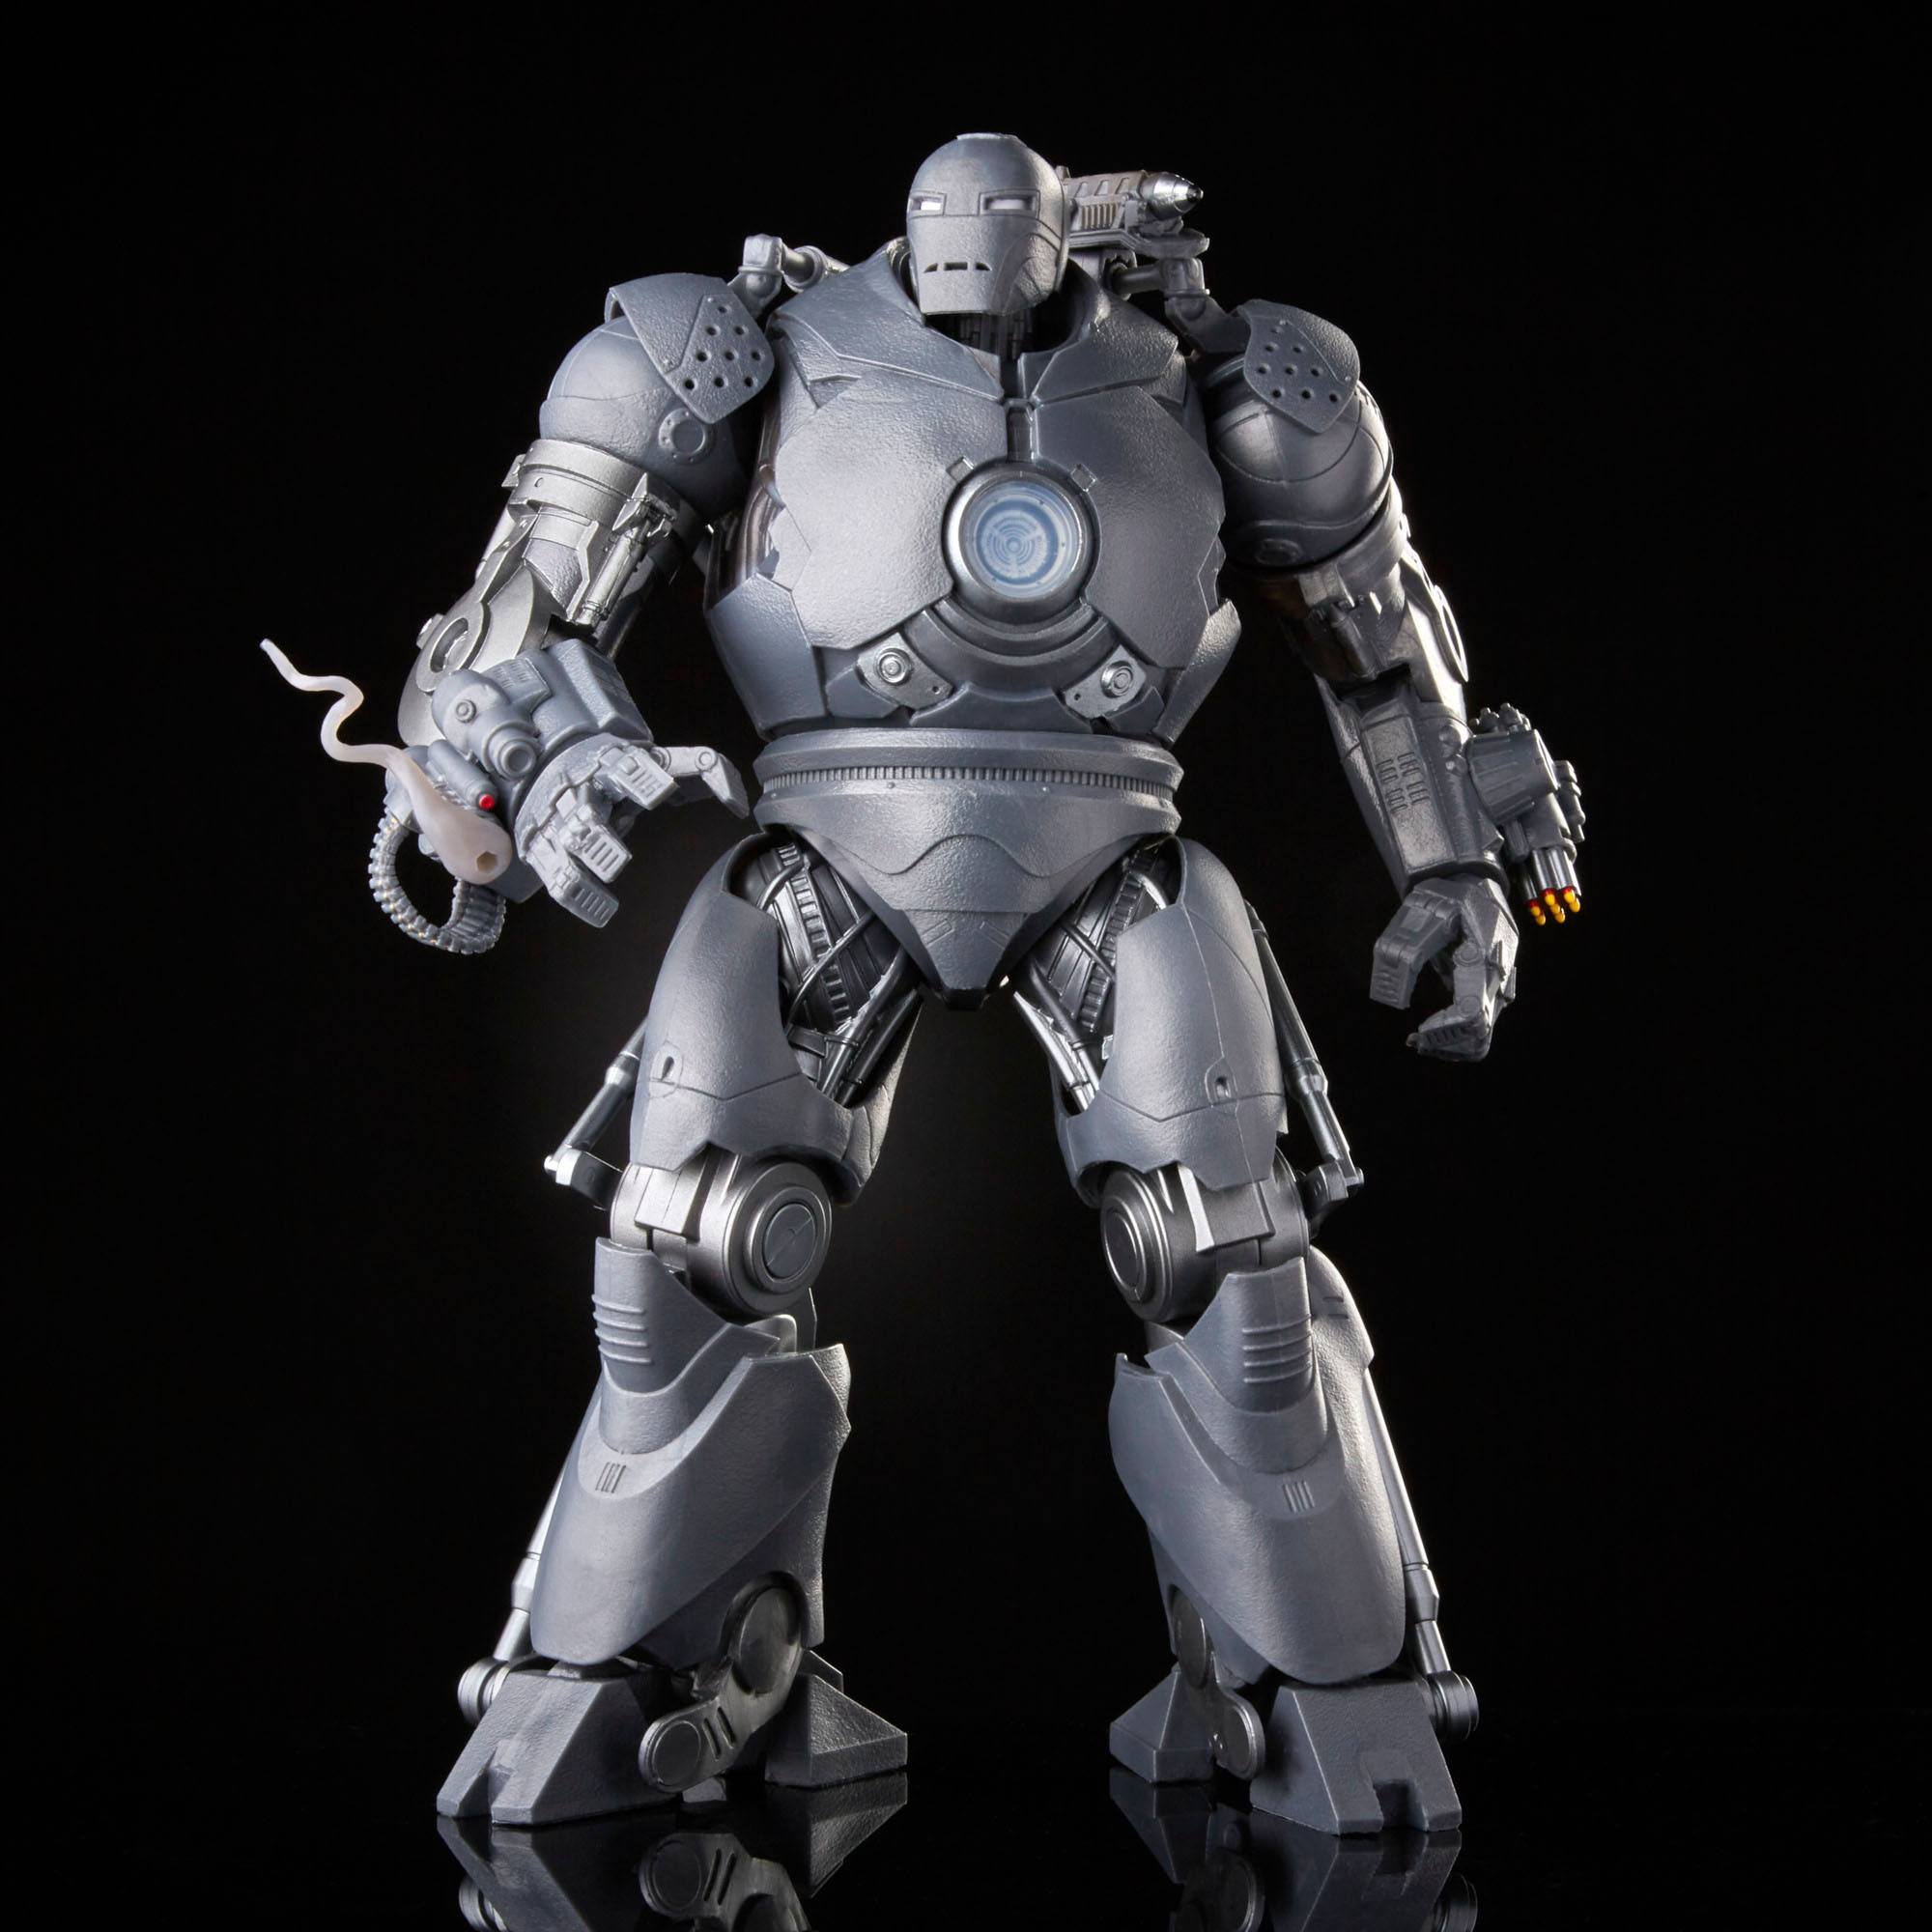 The Infinity Saga Marvel Legends Actionfiguren 2021 Obadiah Stane & Iron Monger (Iron Man) 15 cm F02185L0 5010993842681